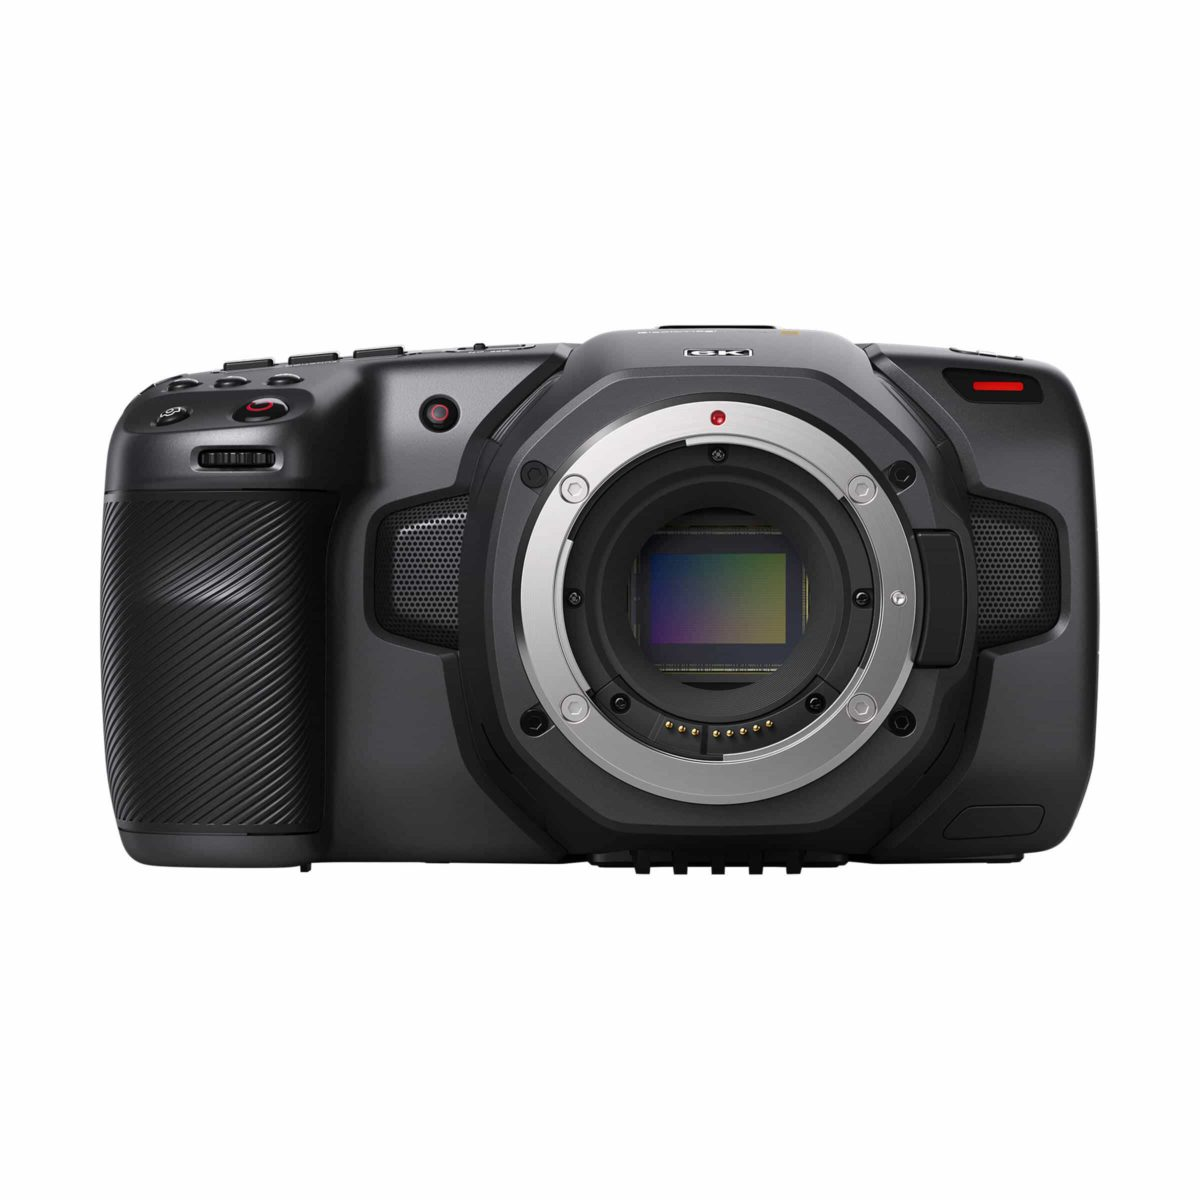 blackmagic_design_pocket_cinema_camera_6k_01